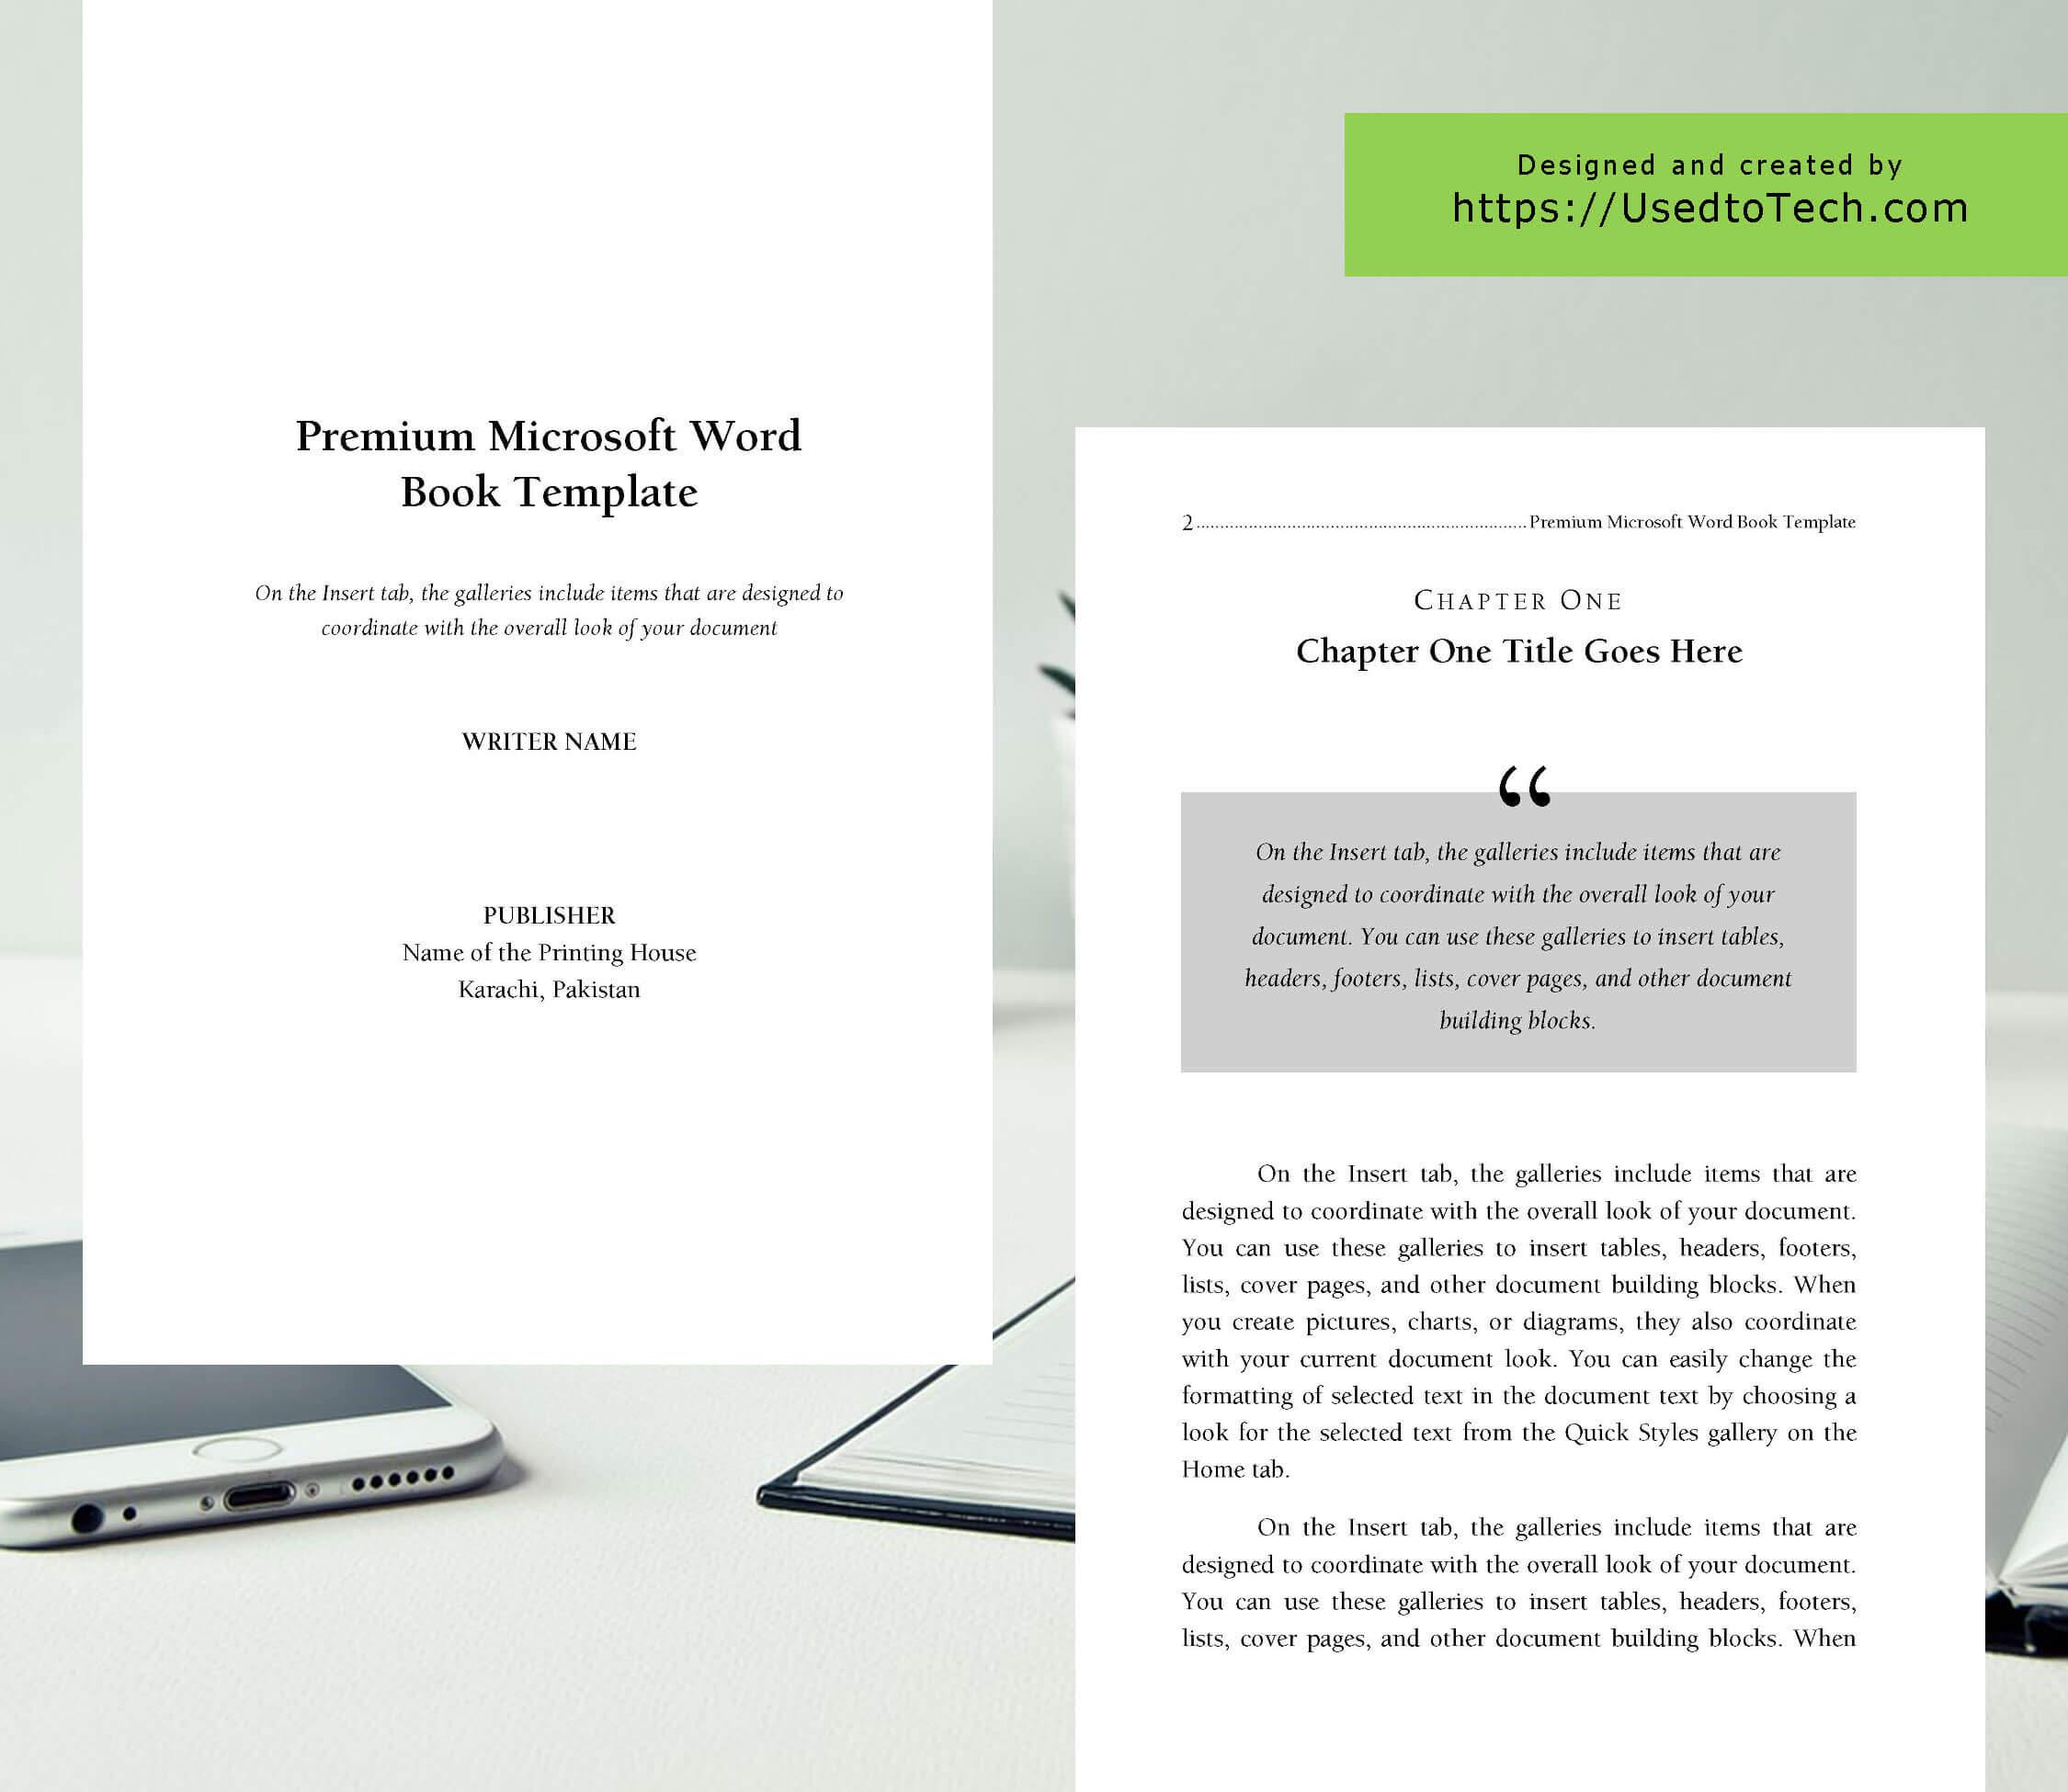 Premium & Free 6 X 9 Book Template For Microsoft Word - Used Intended For 6X9 Book Template For Word